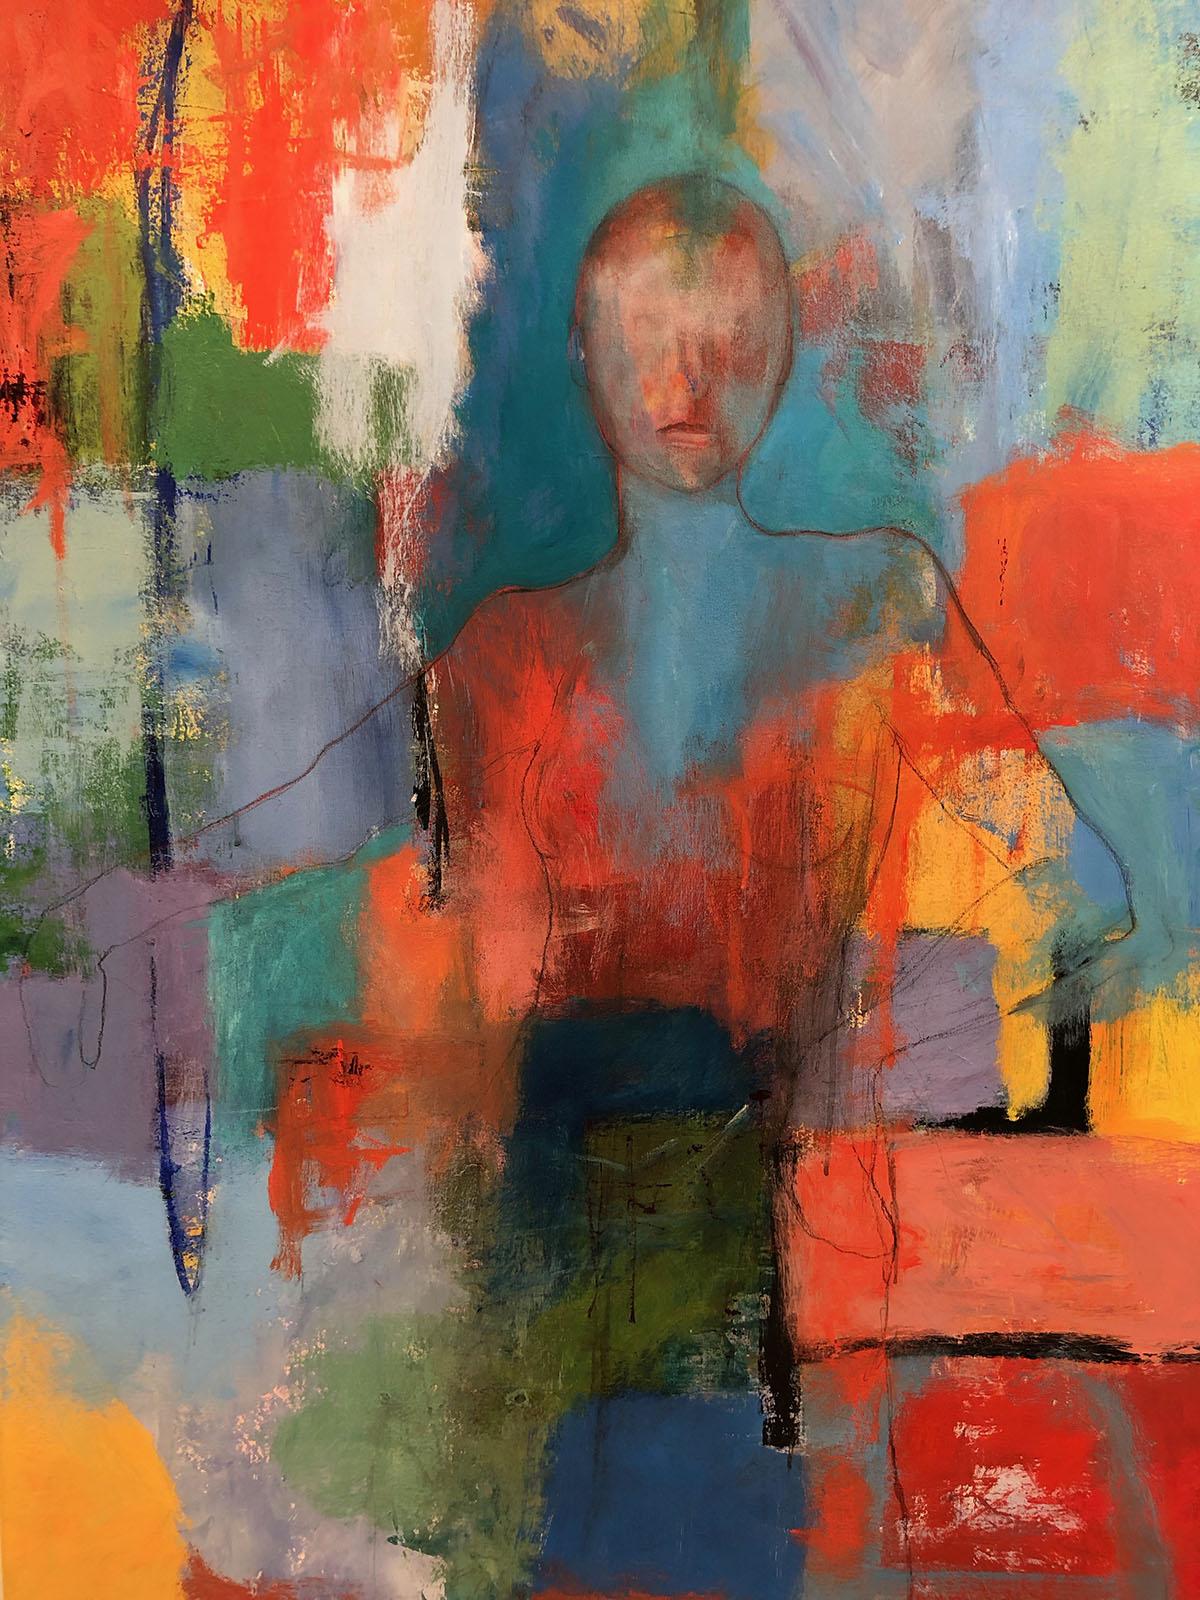 Stay Calm work by Susan Tilt (October 2019)